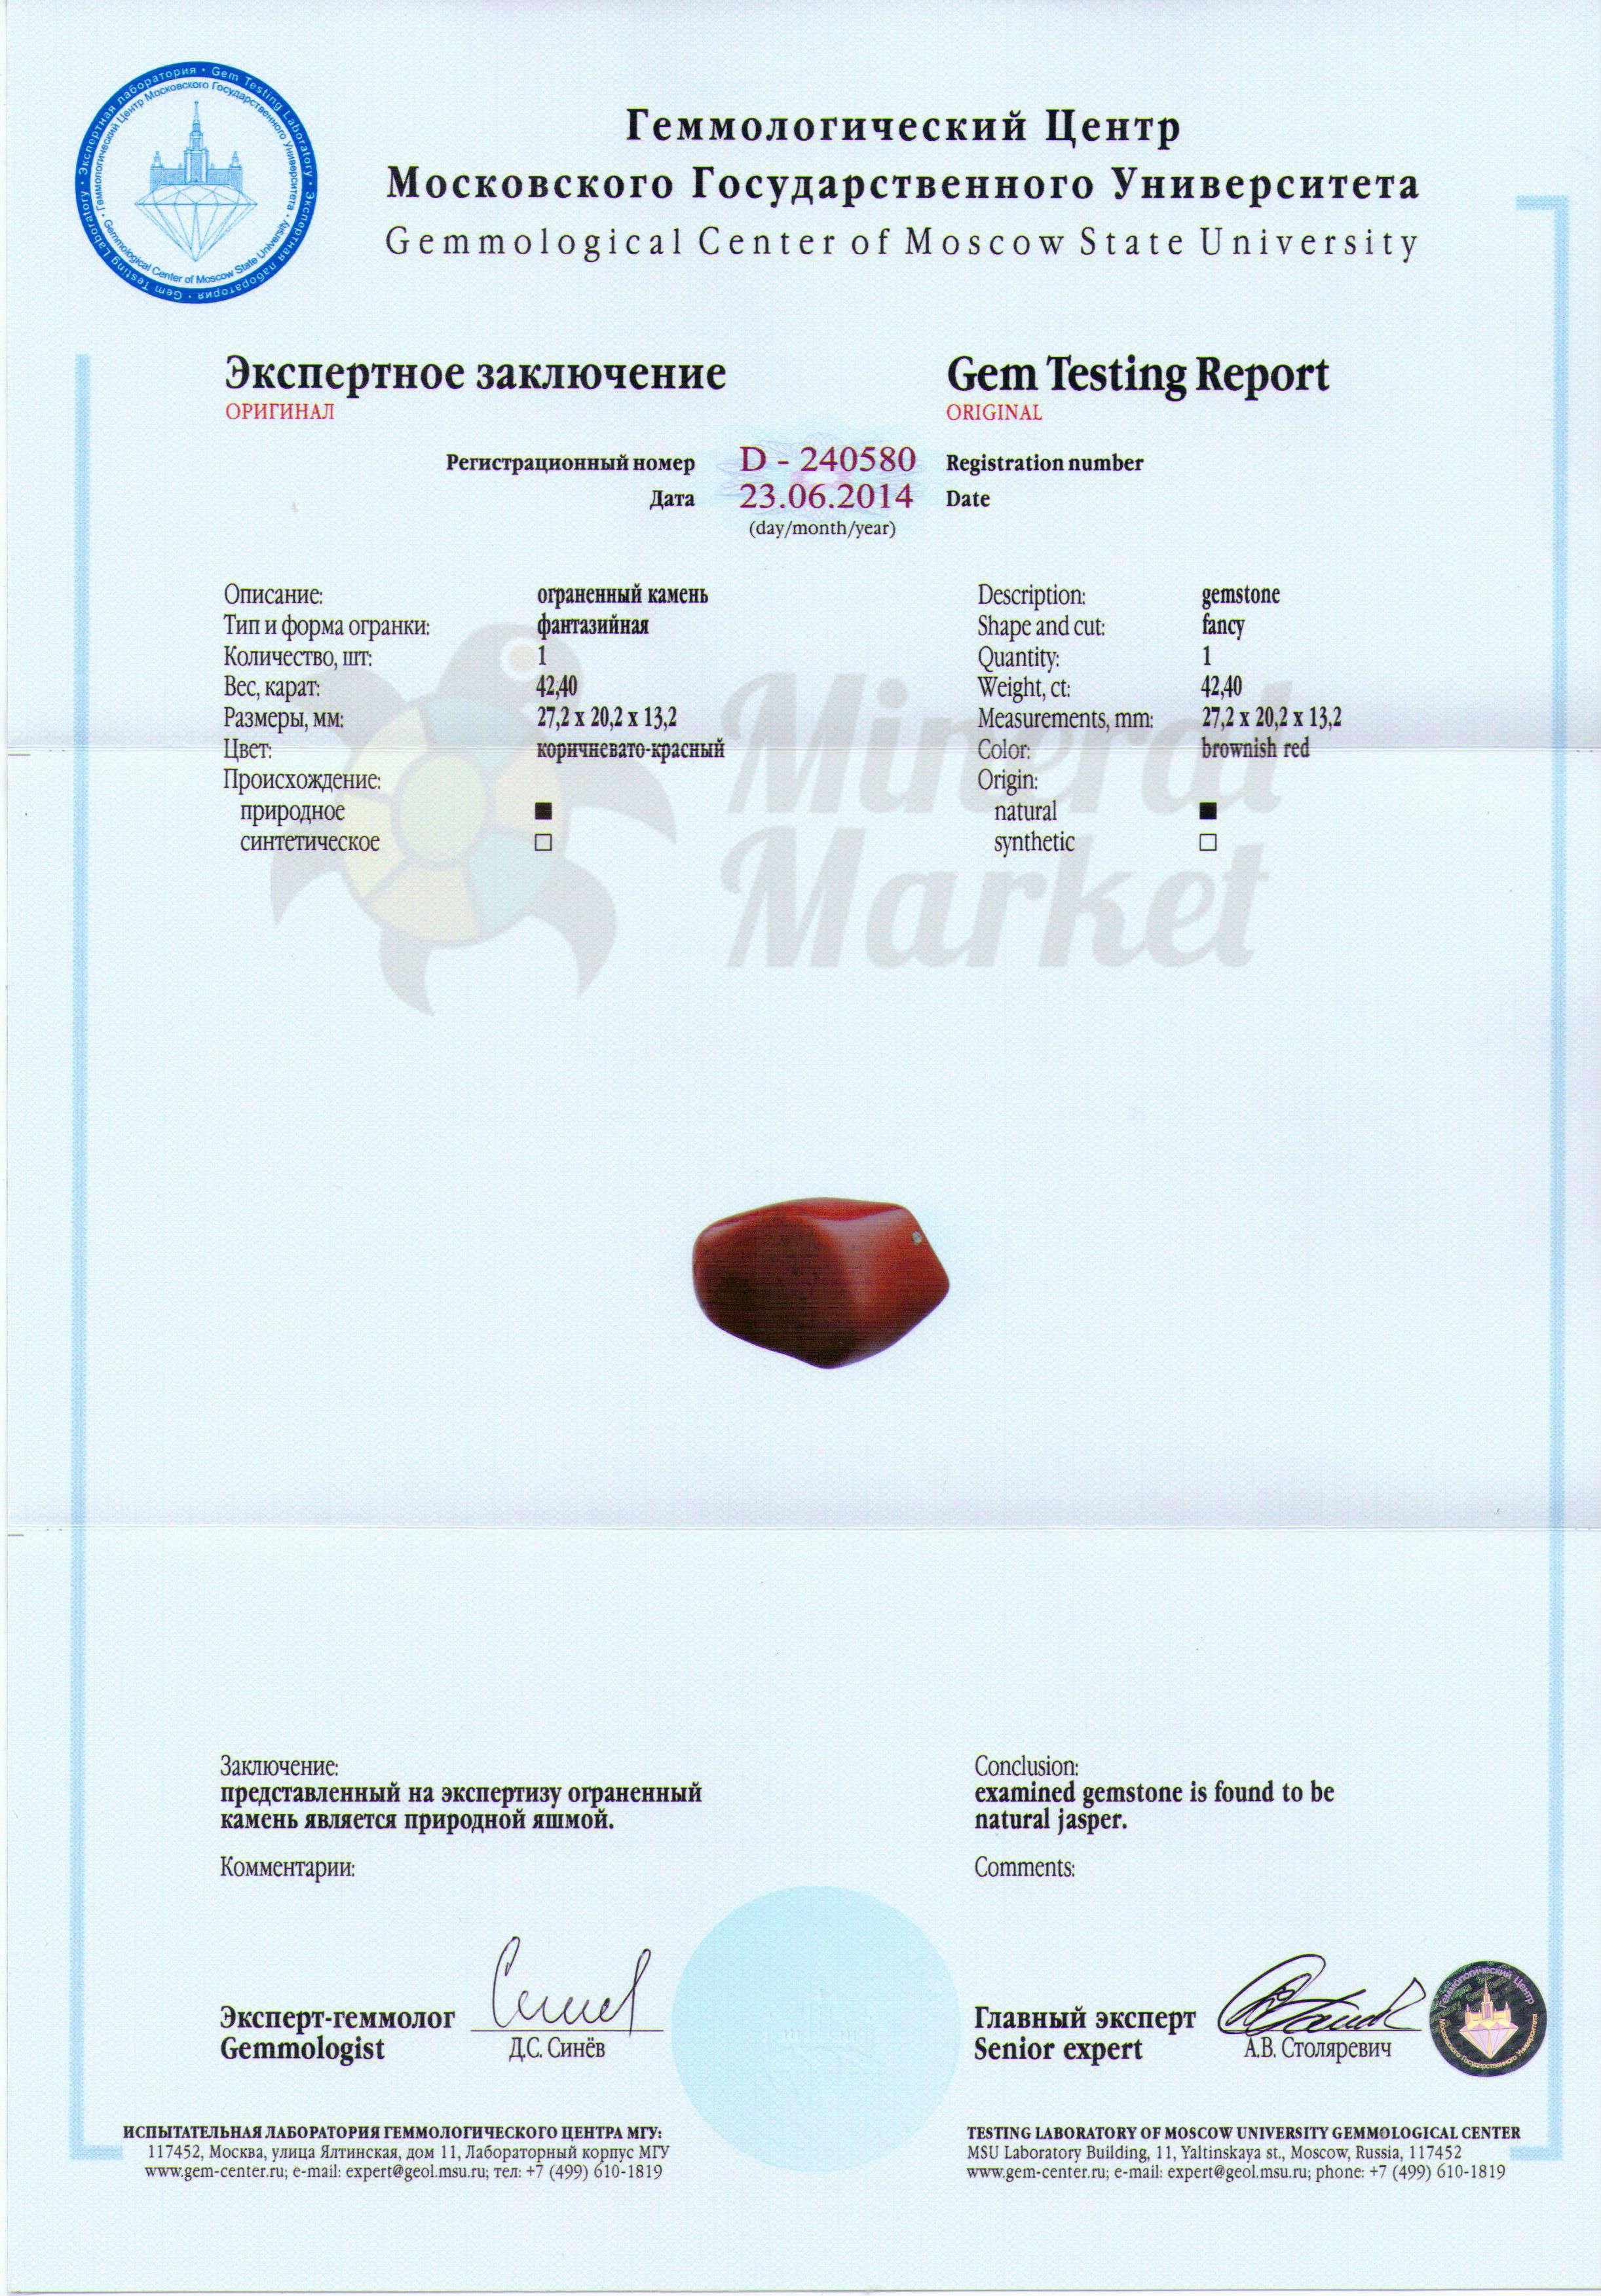 http://mineralmarket.ru/img/certificate/150.jpg